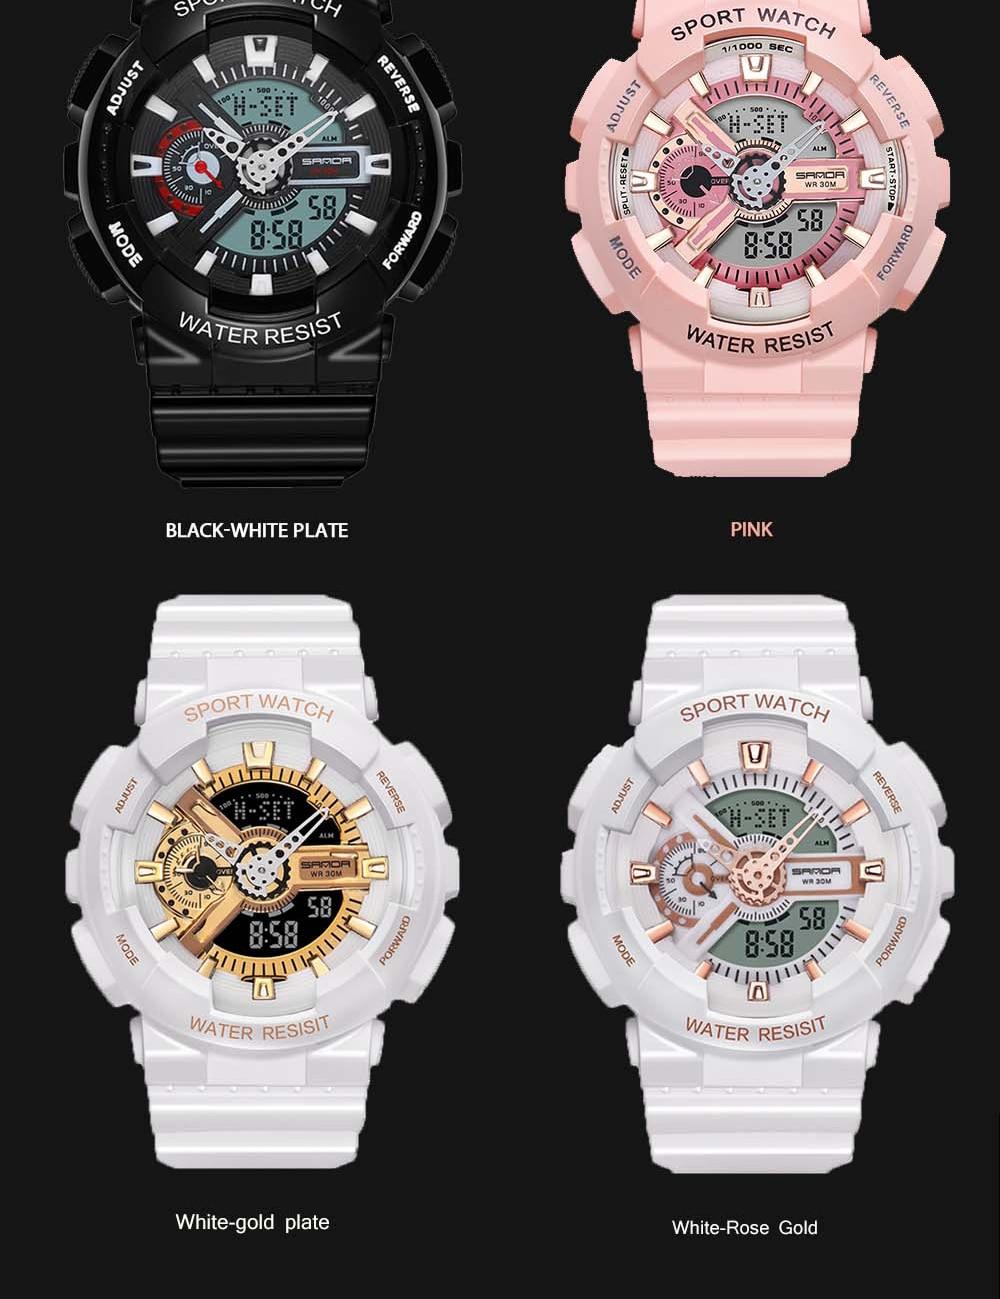 Hd072e4558b41492b83bbaf8df005b004g 2020 SANDA Military Men's Watch Brand Luxury Waterproof Sport Wristwatch Fashion Quartz Clock Couple Watch relogio masculino